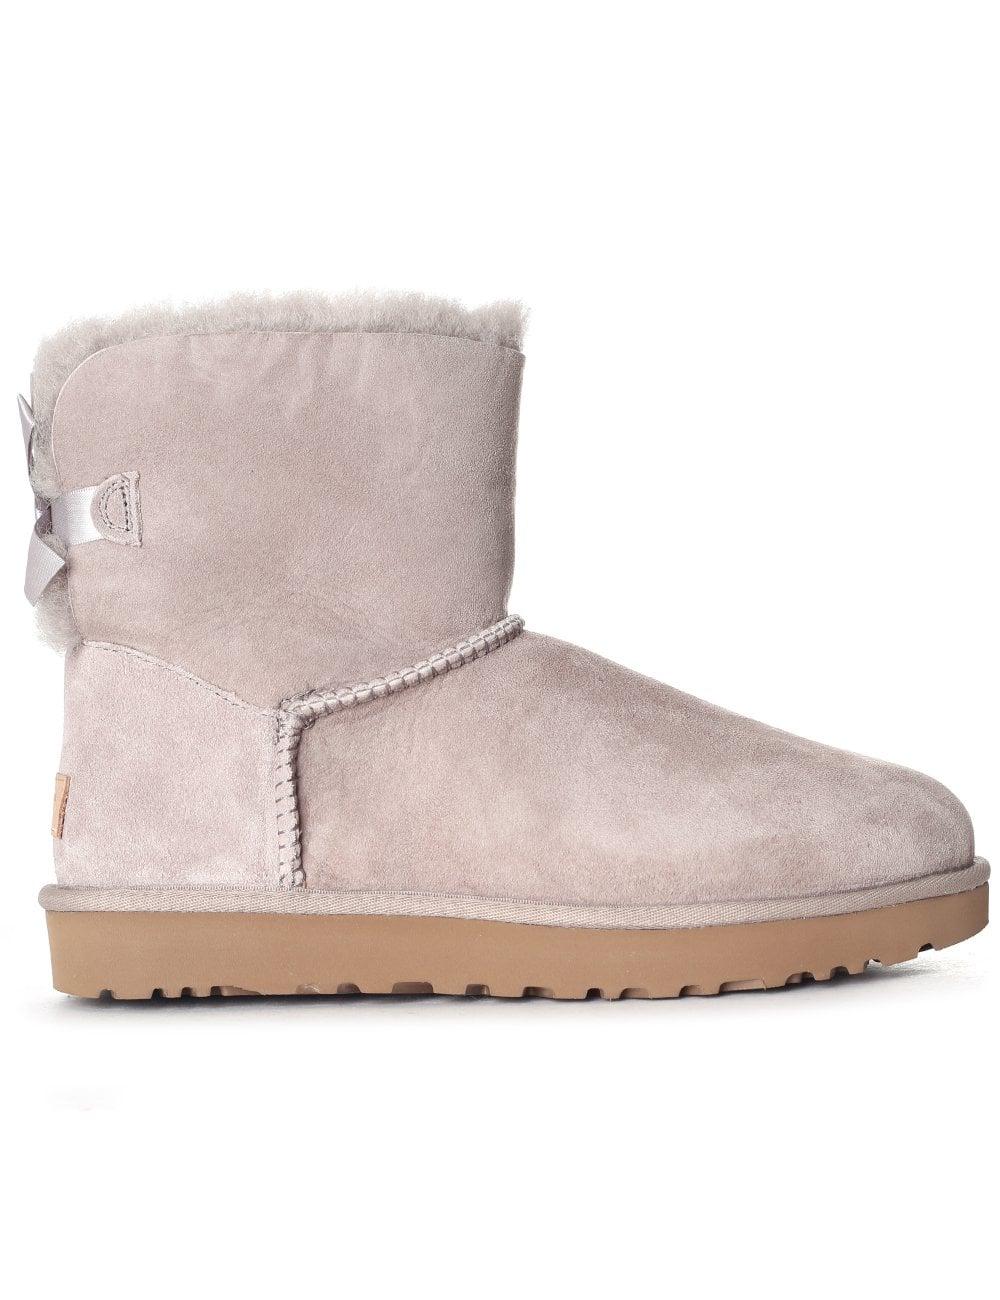 7e859010595 Women's Mini Bailey Bow ll Boot